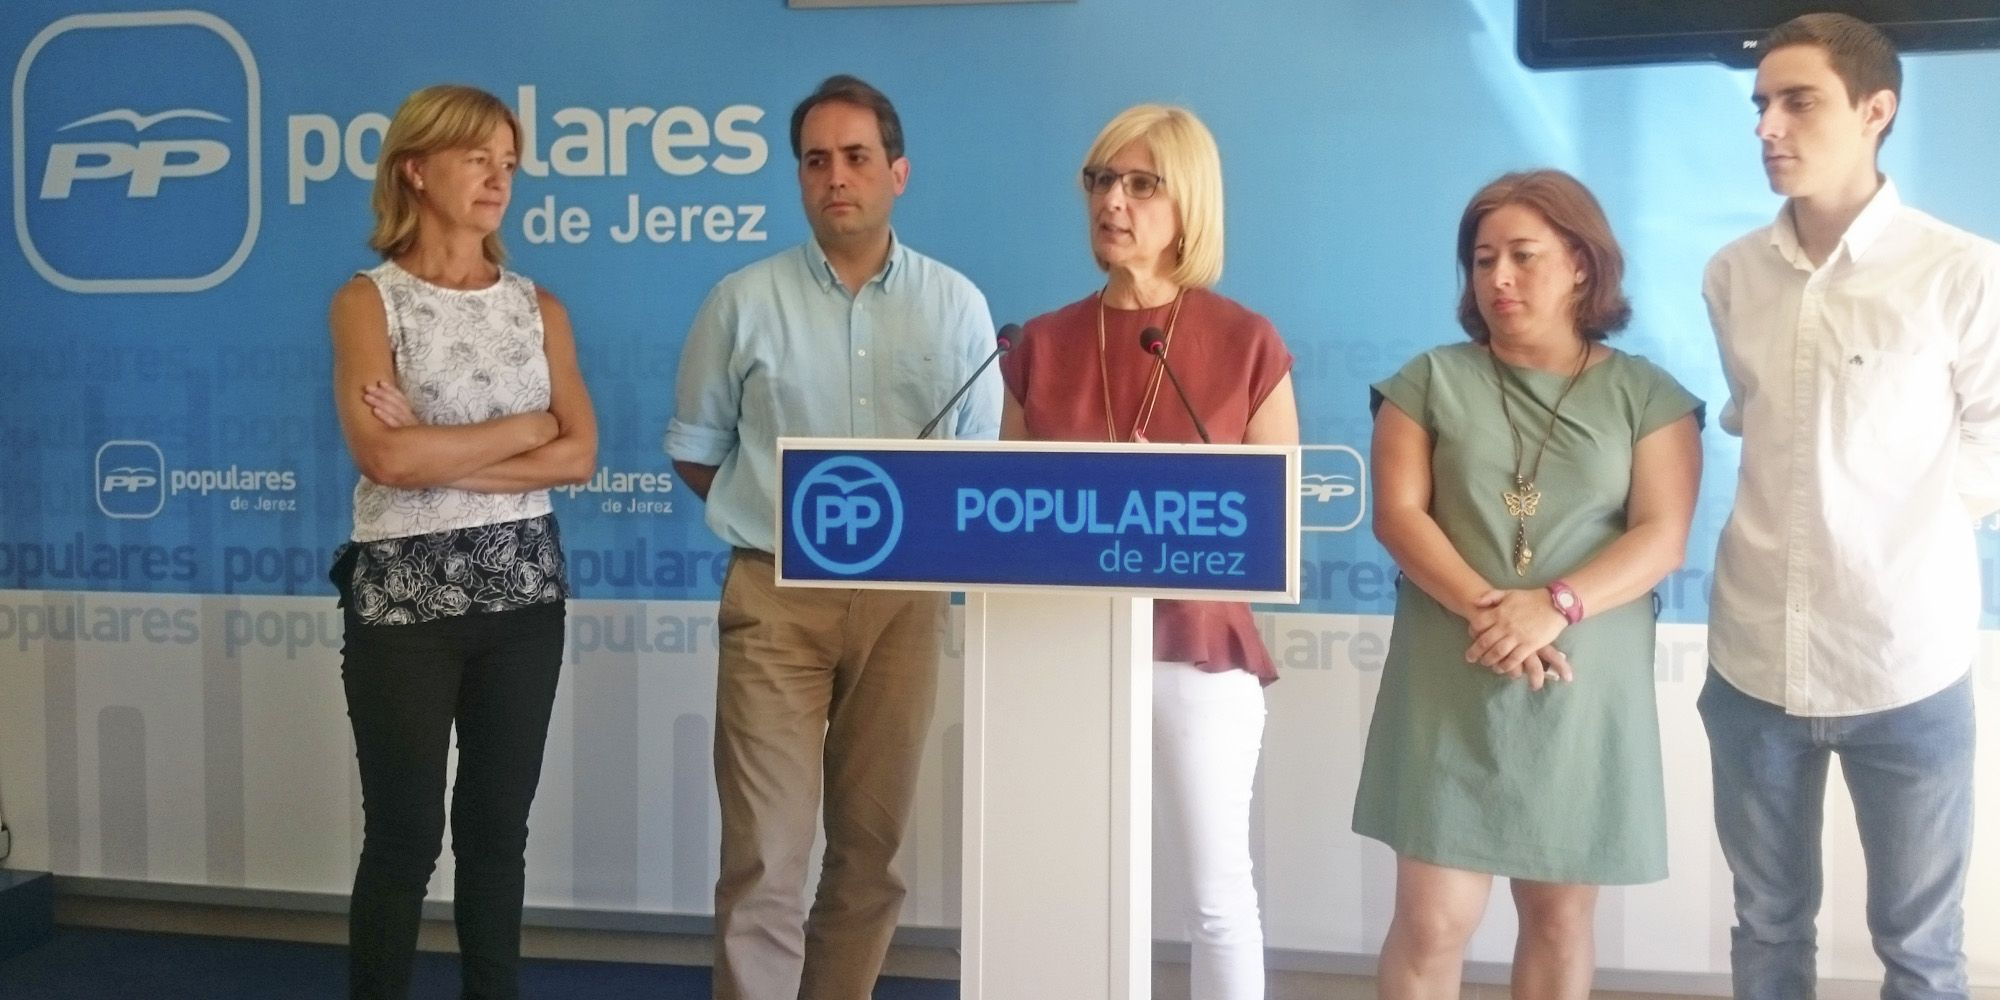 pp jerez 14jun16 2